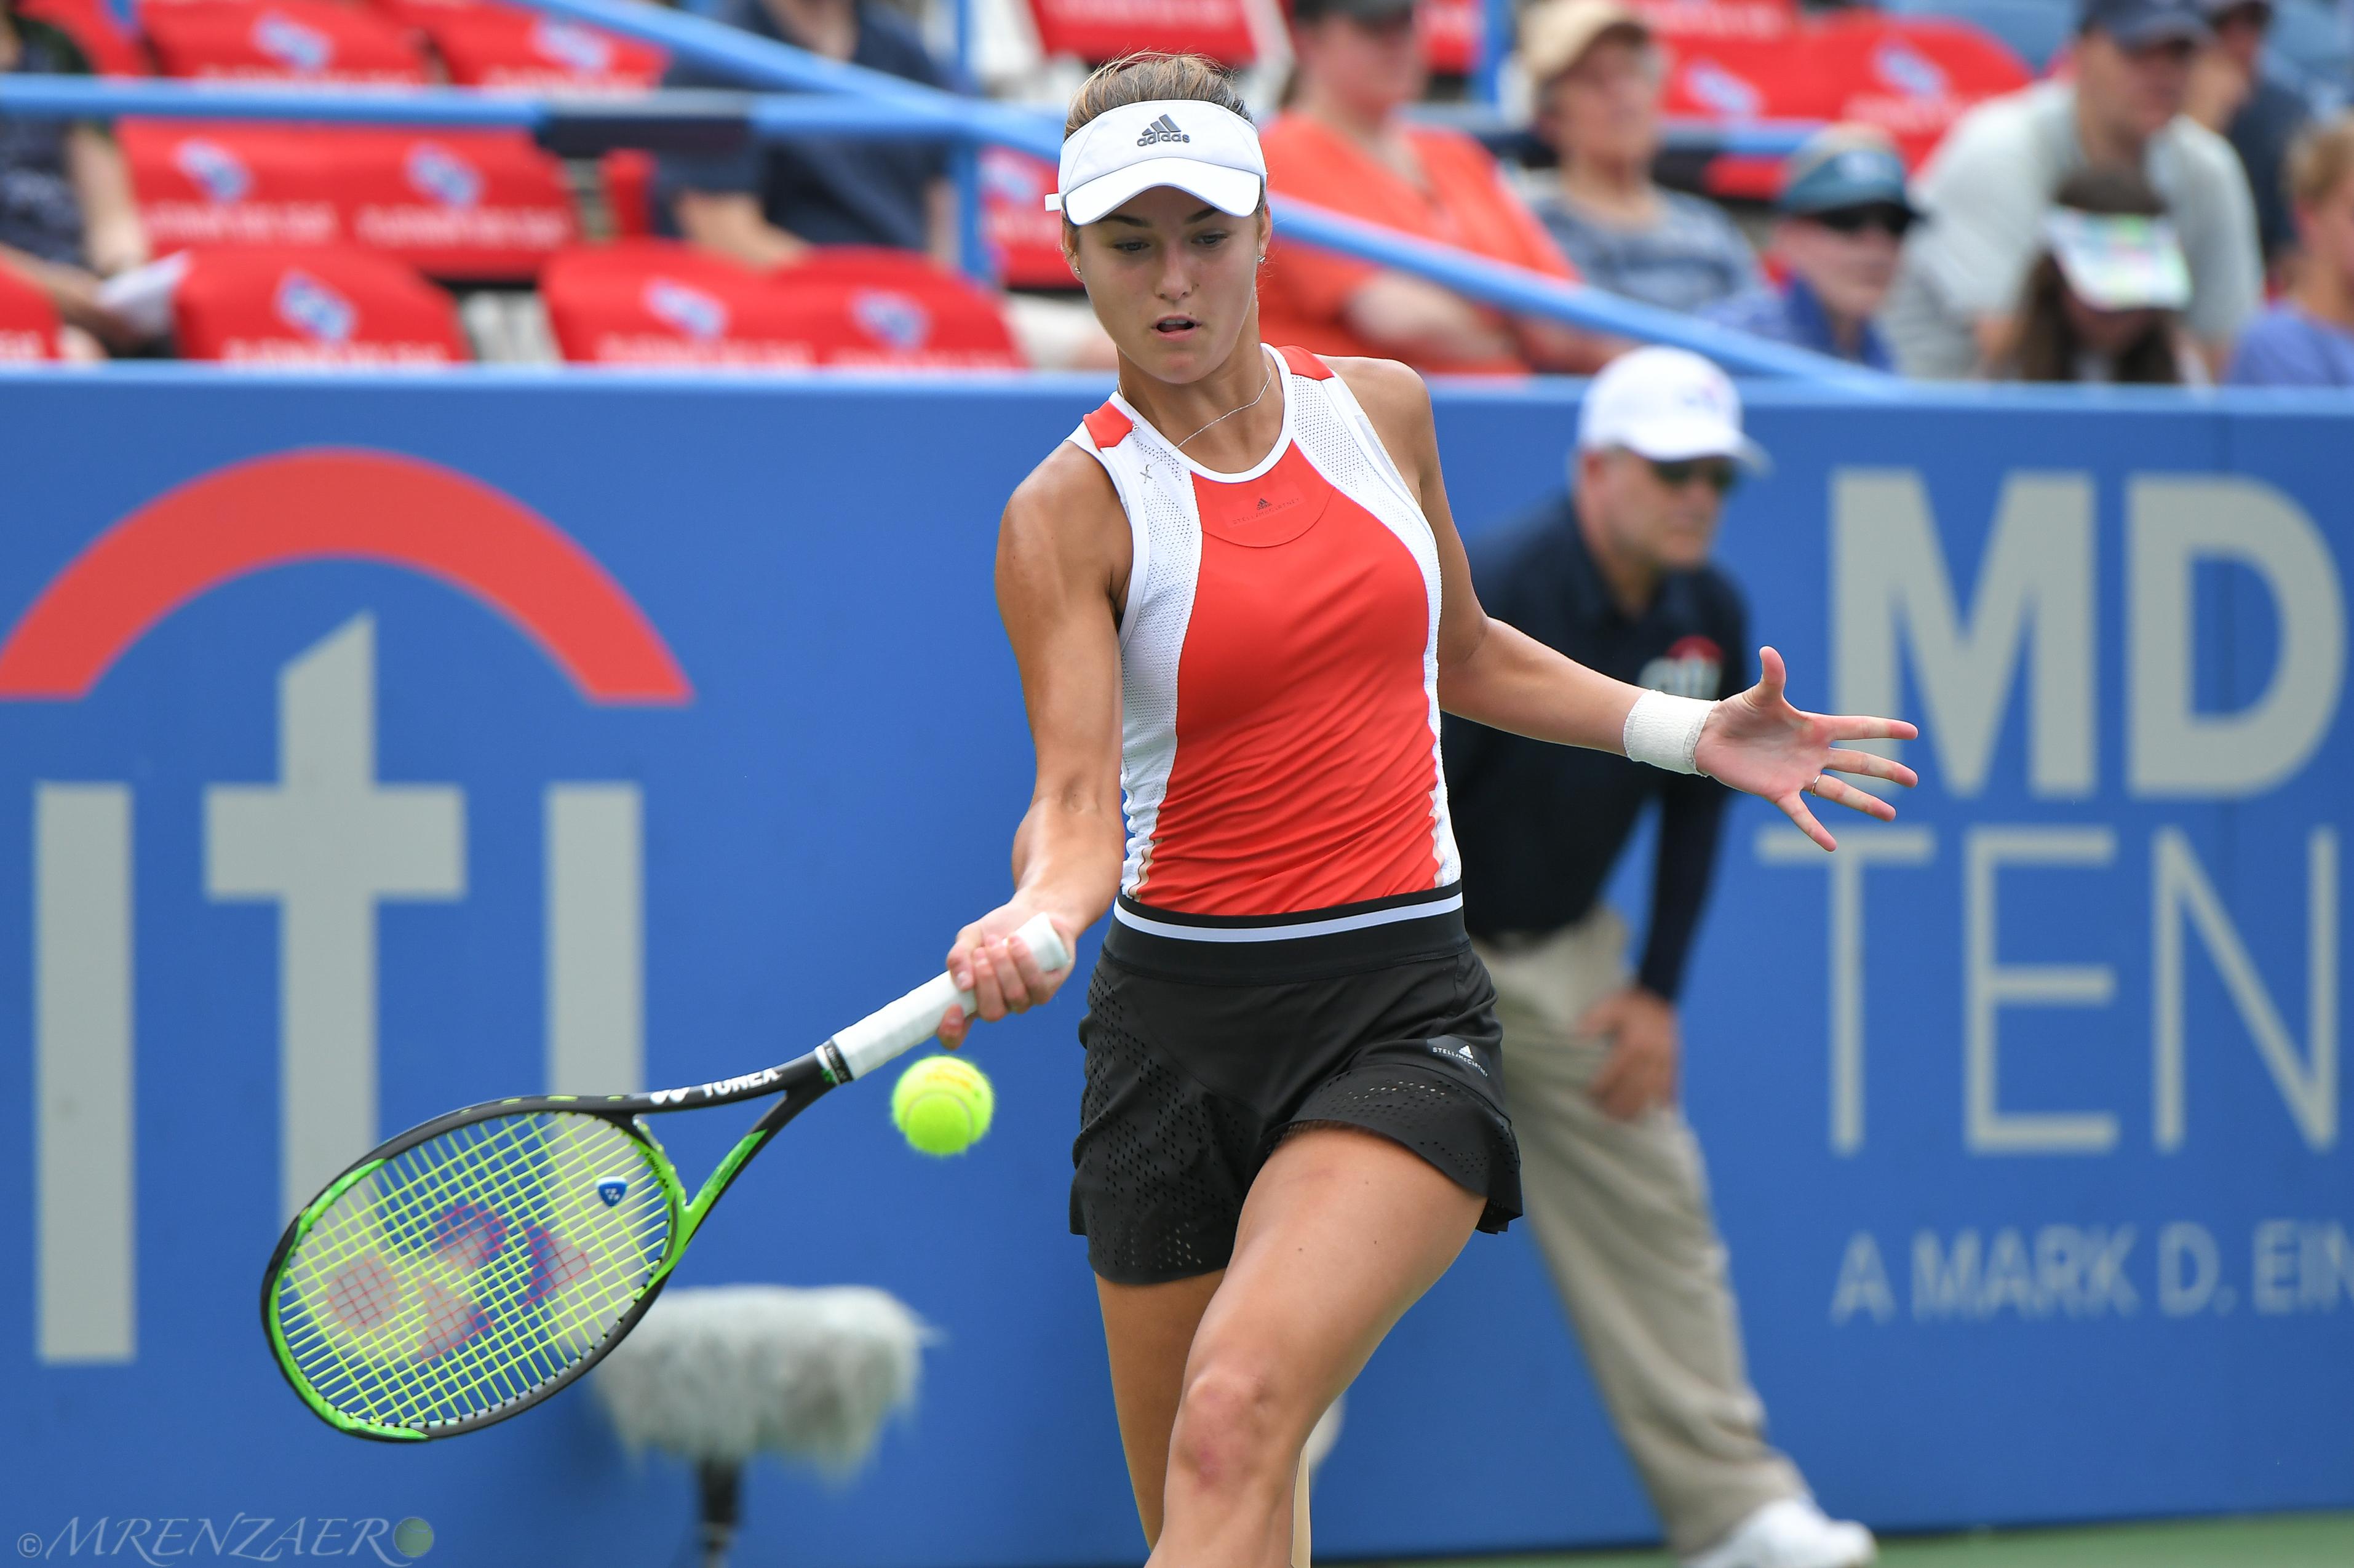 Anna Kalinskaya 2019 Citi Open (Photo: Mike Renz for TennisAtlantic.com)